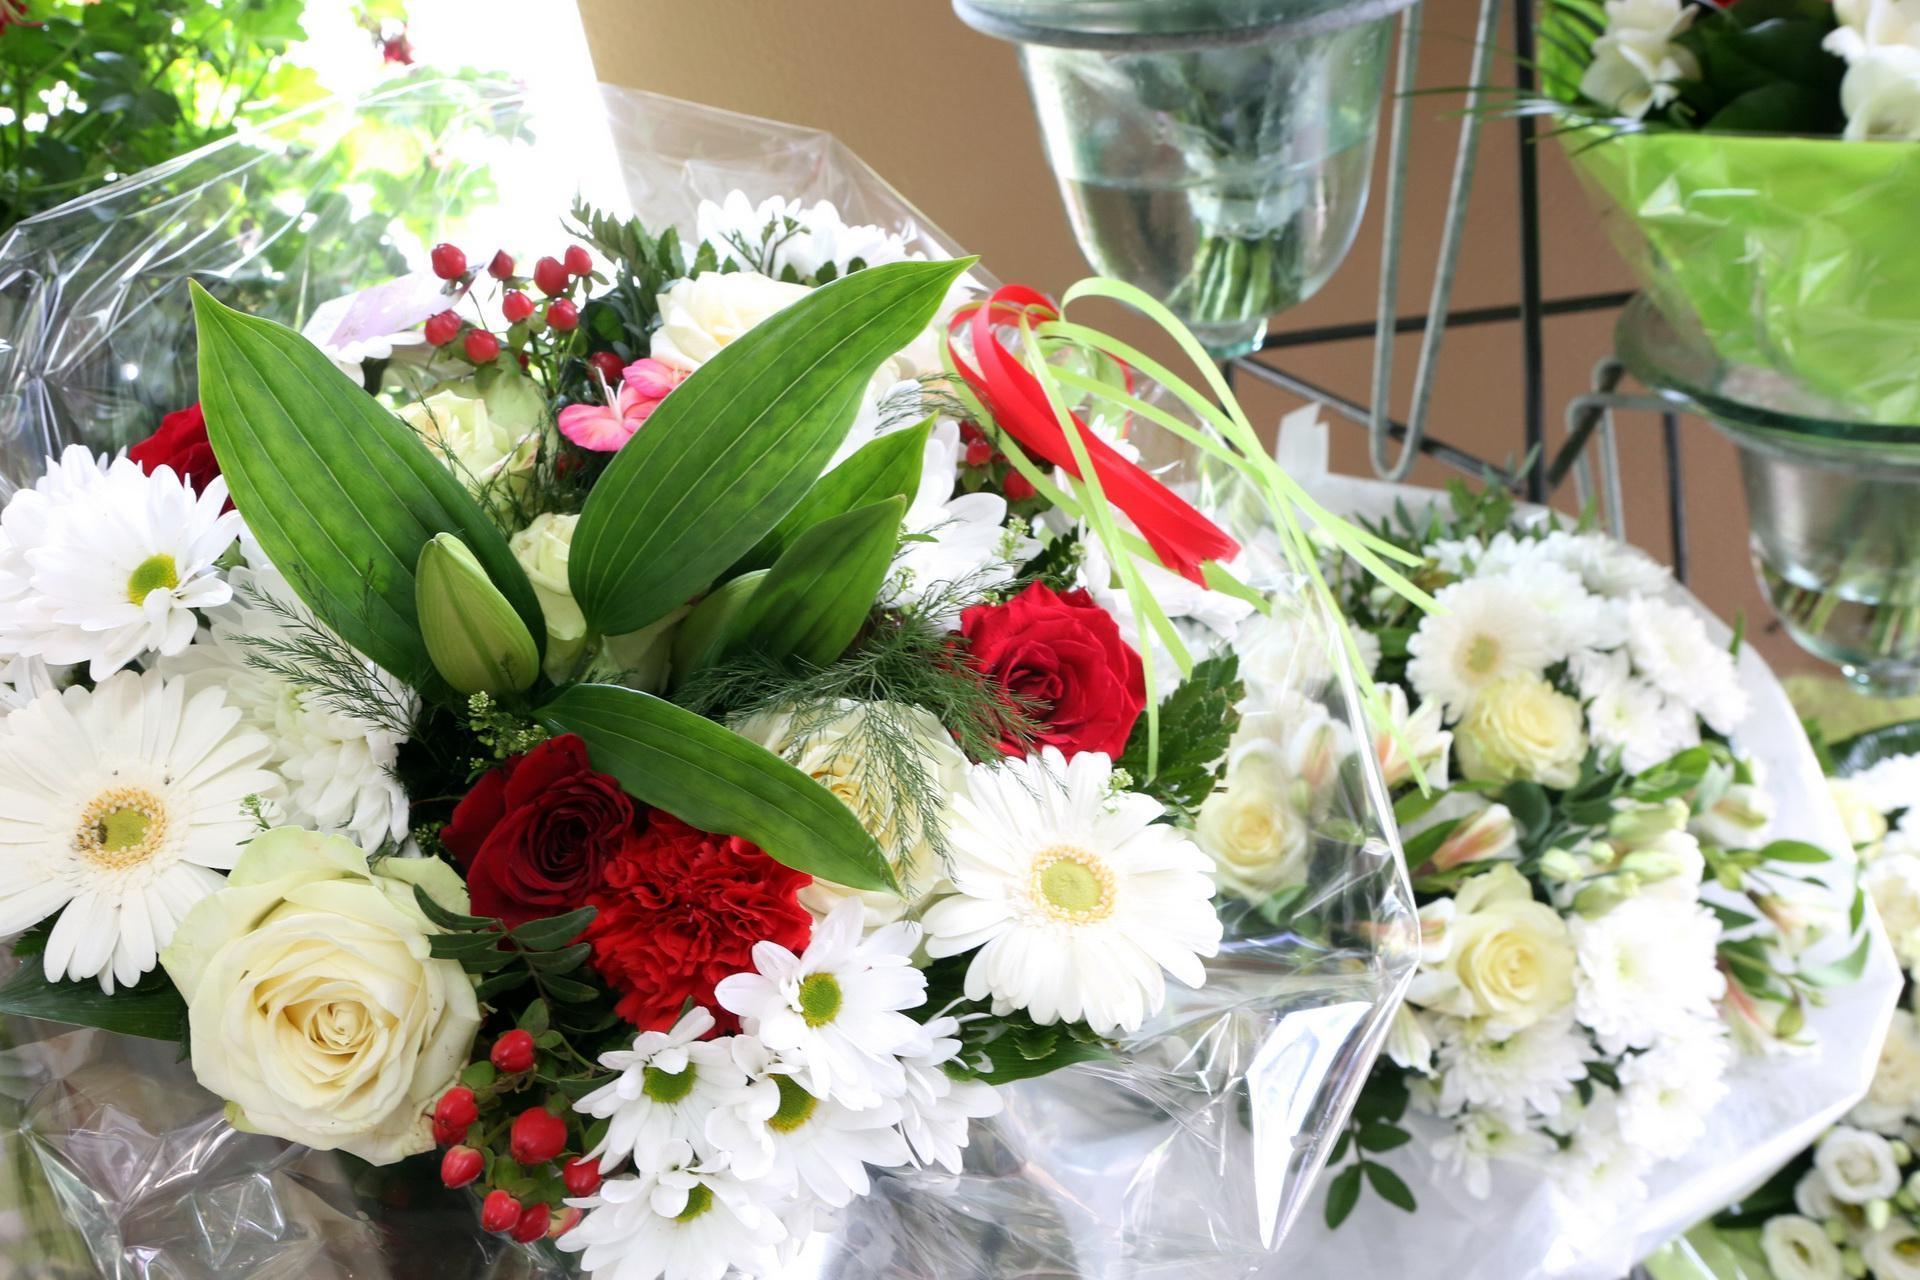 Fleuriste-Leloup-Genval-003.jpg